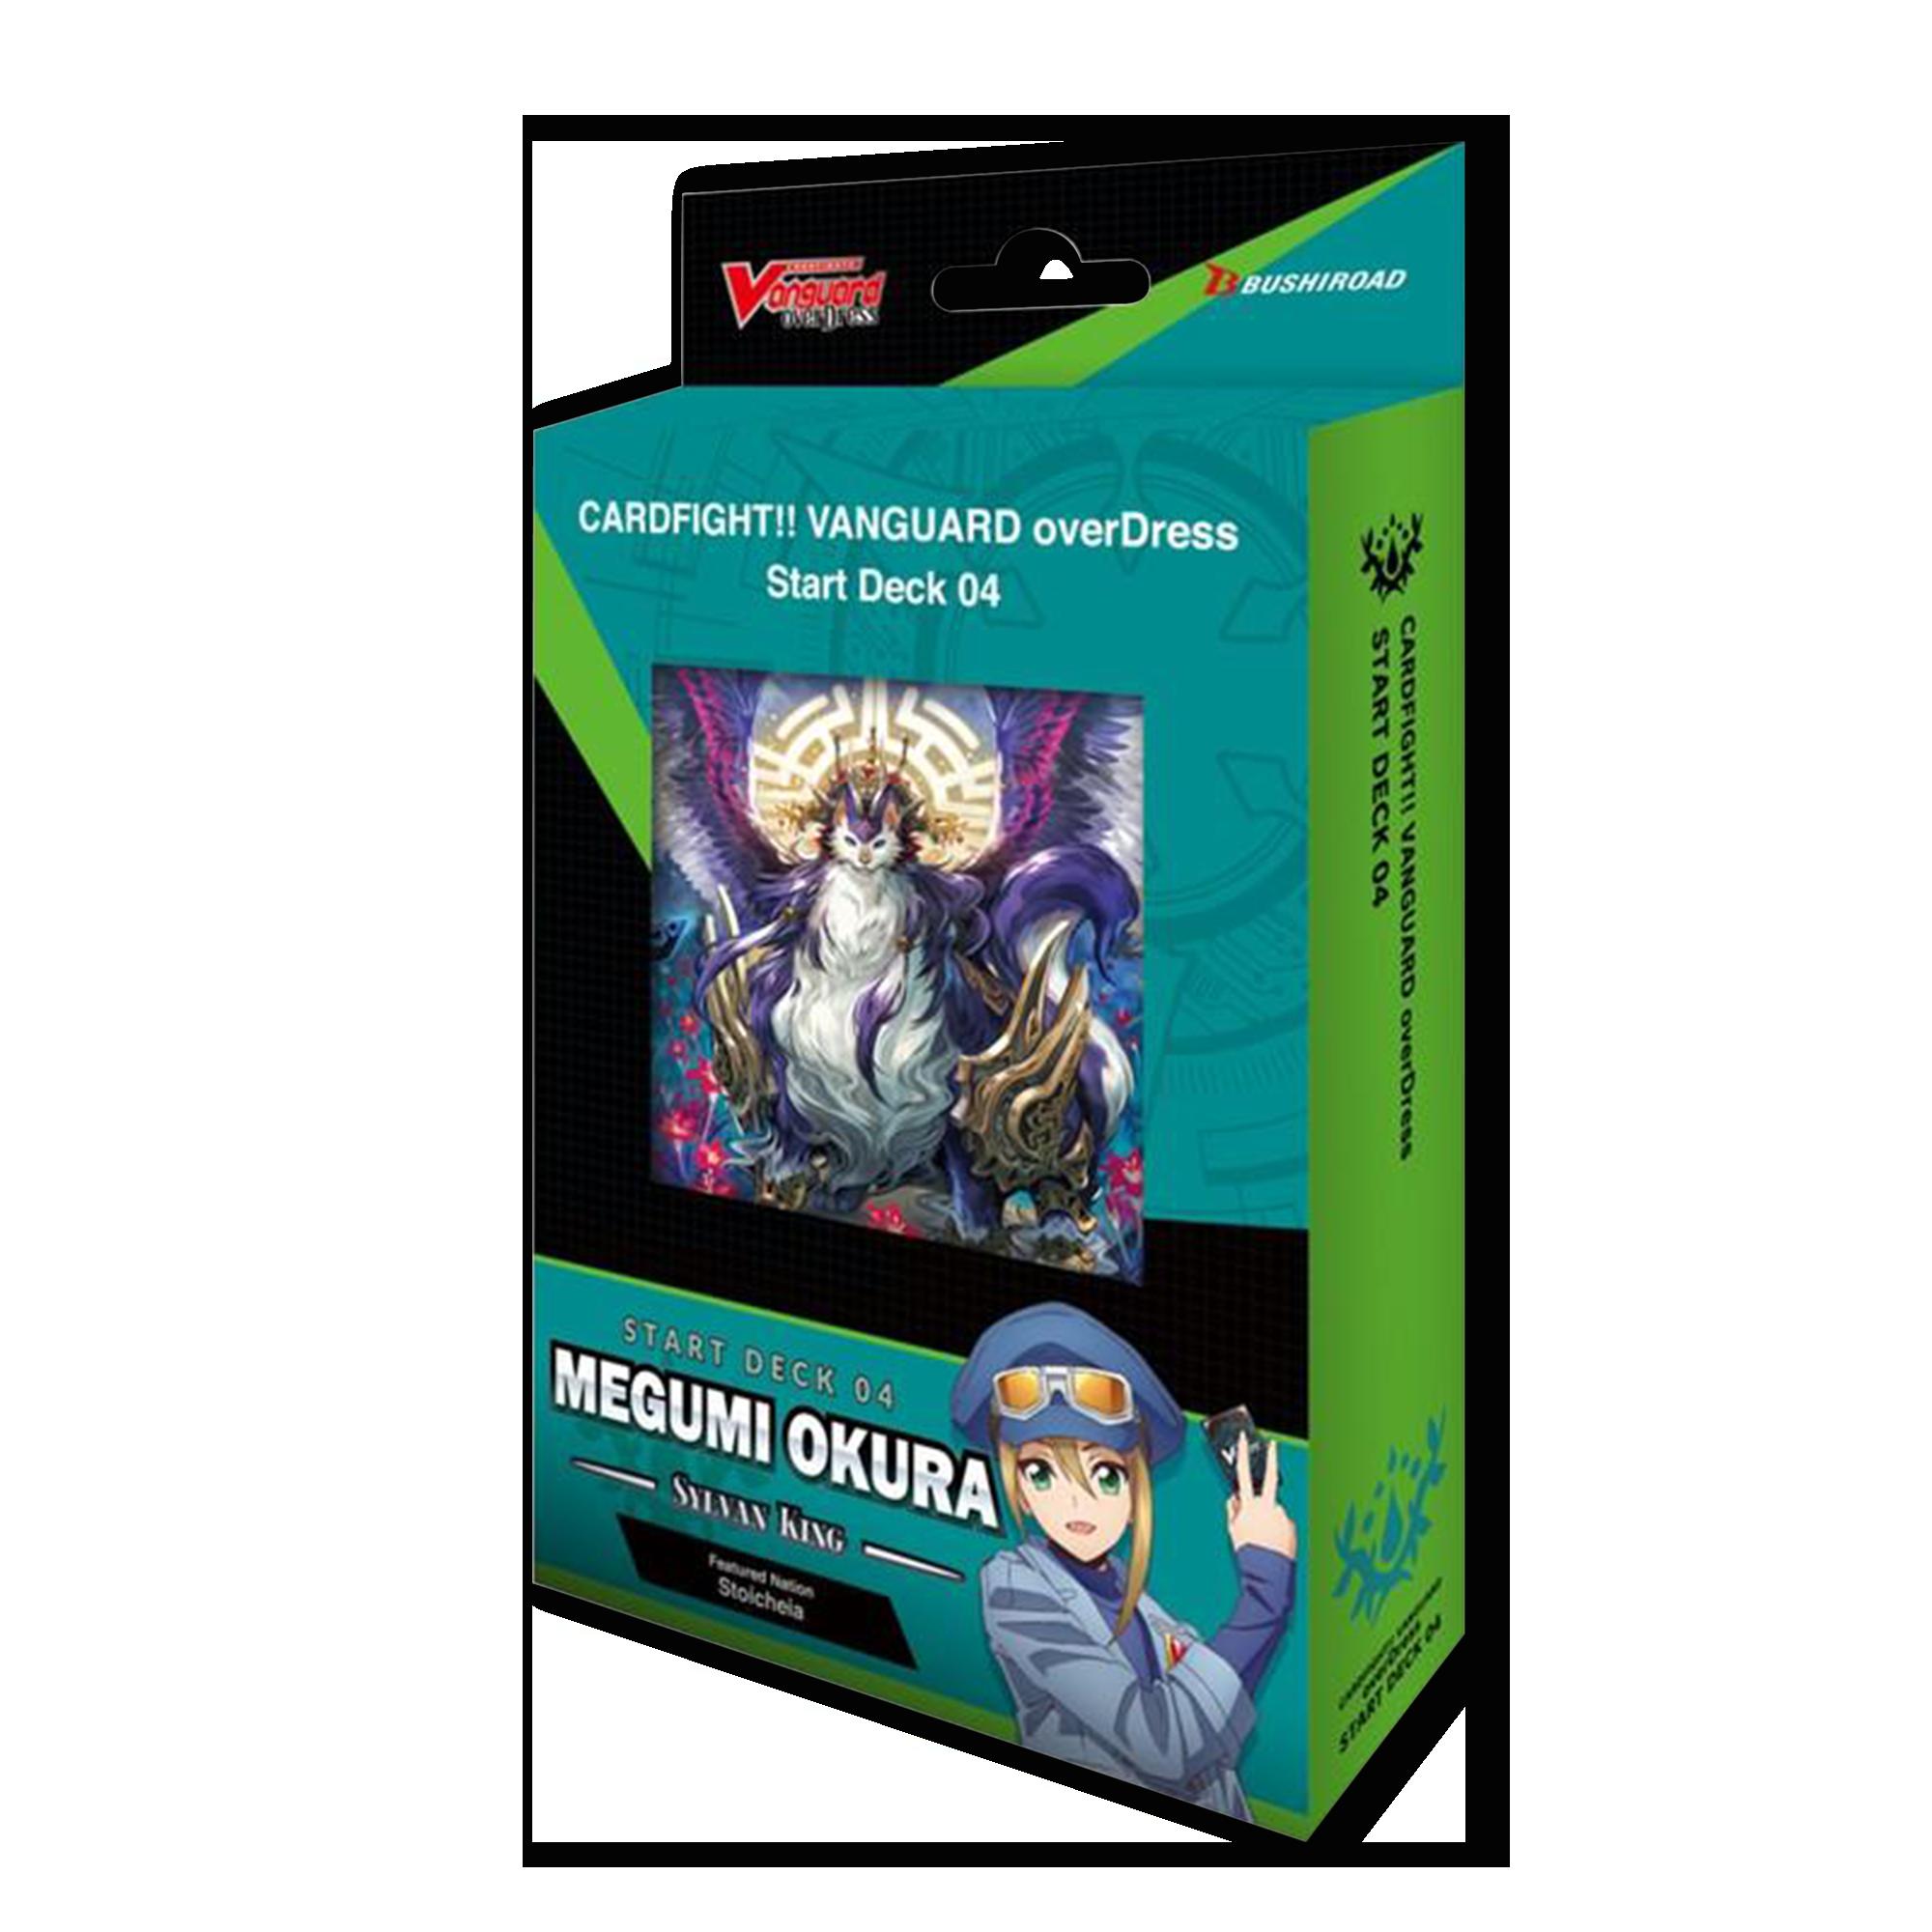 Cardfight!! Vanguard overDress - Sylvan King Start Deck